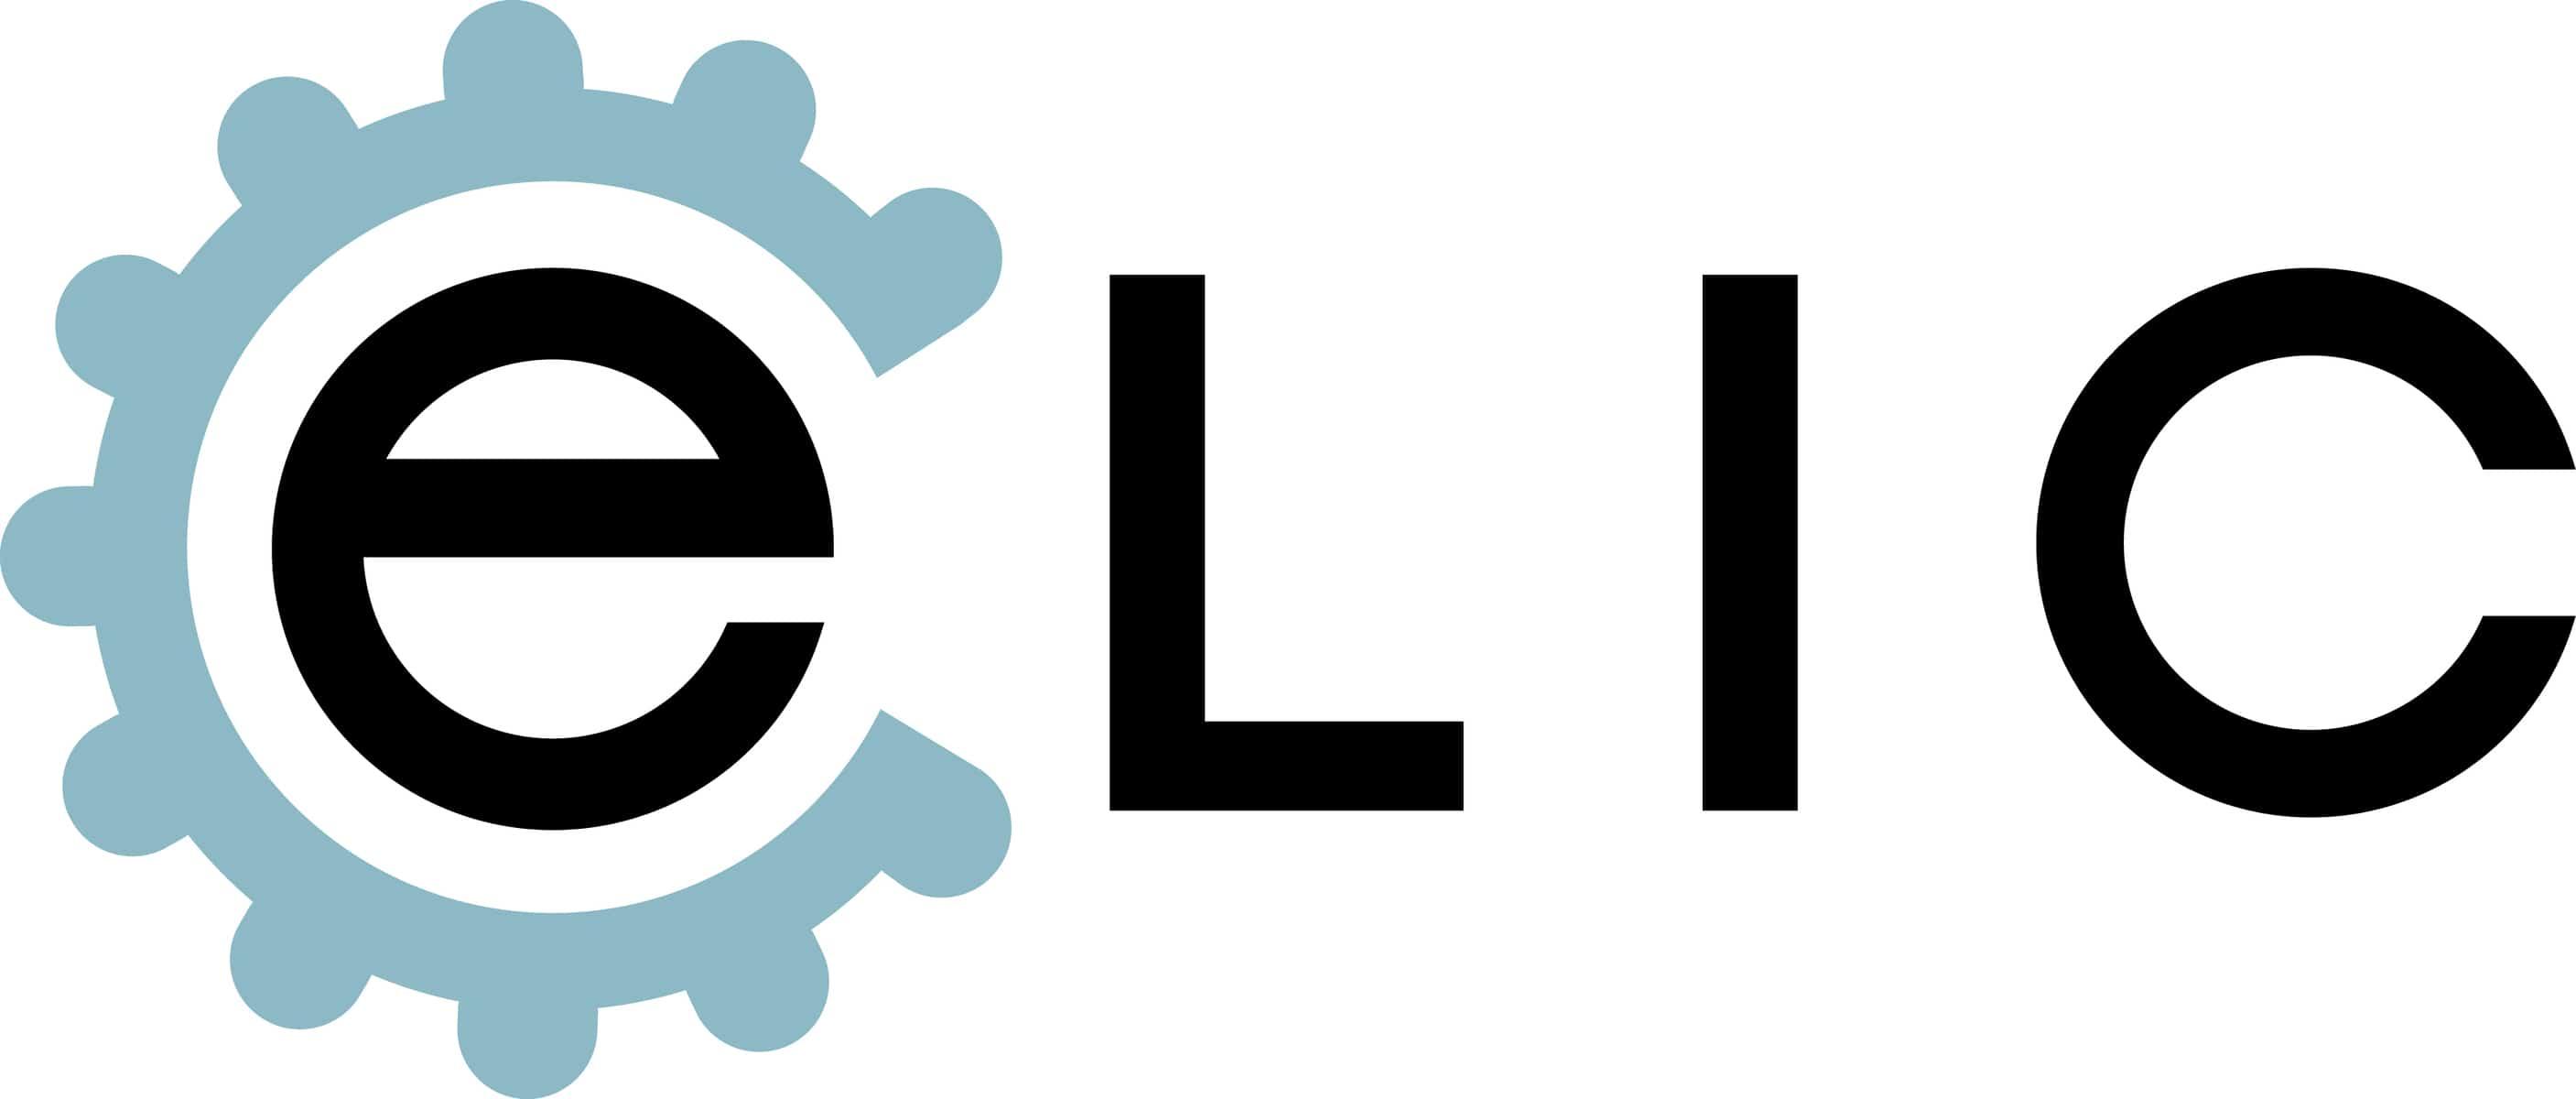 ELIC – Engineering Literacy Online » FH JOANNEUM